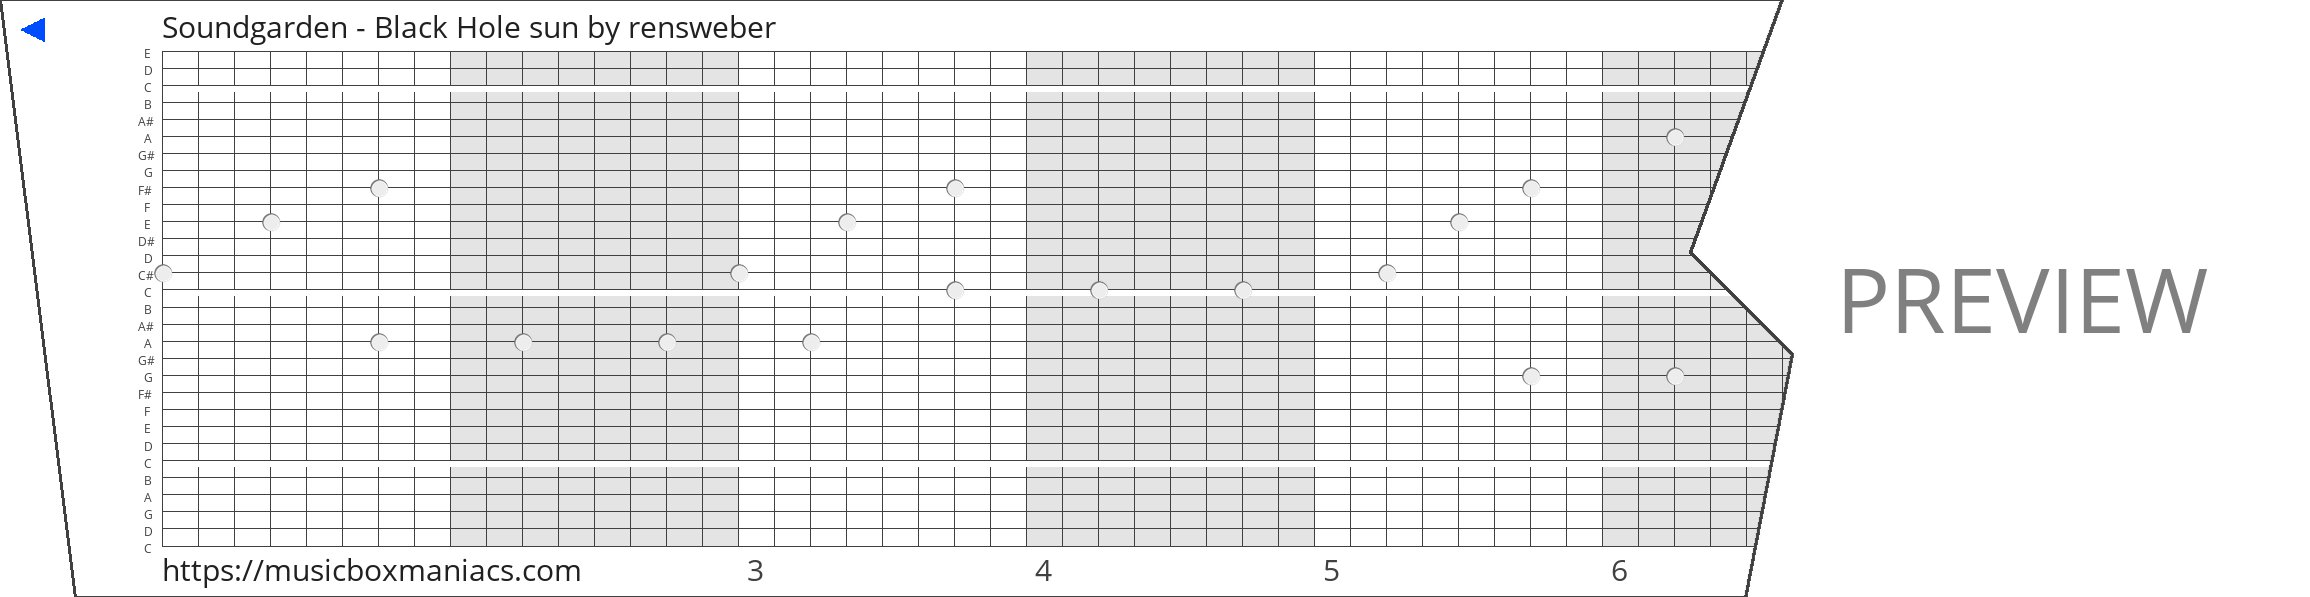 Soundgarden - Black Hole sun 30 note music box paper strip